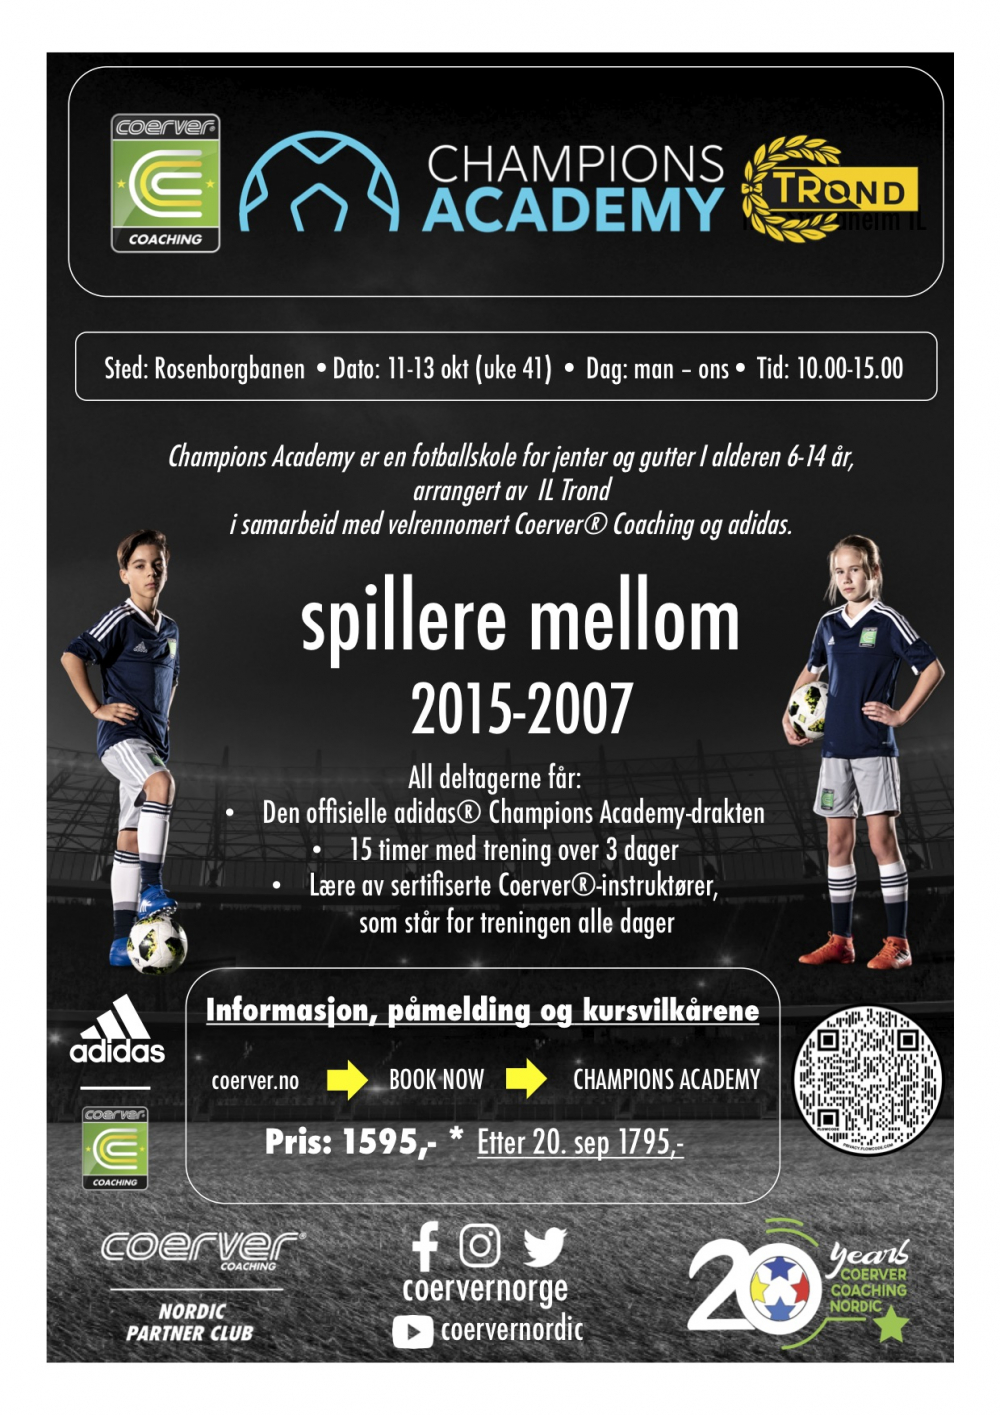 Champions Academy hos IL Trond 2021